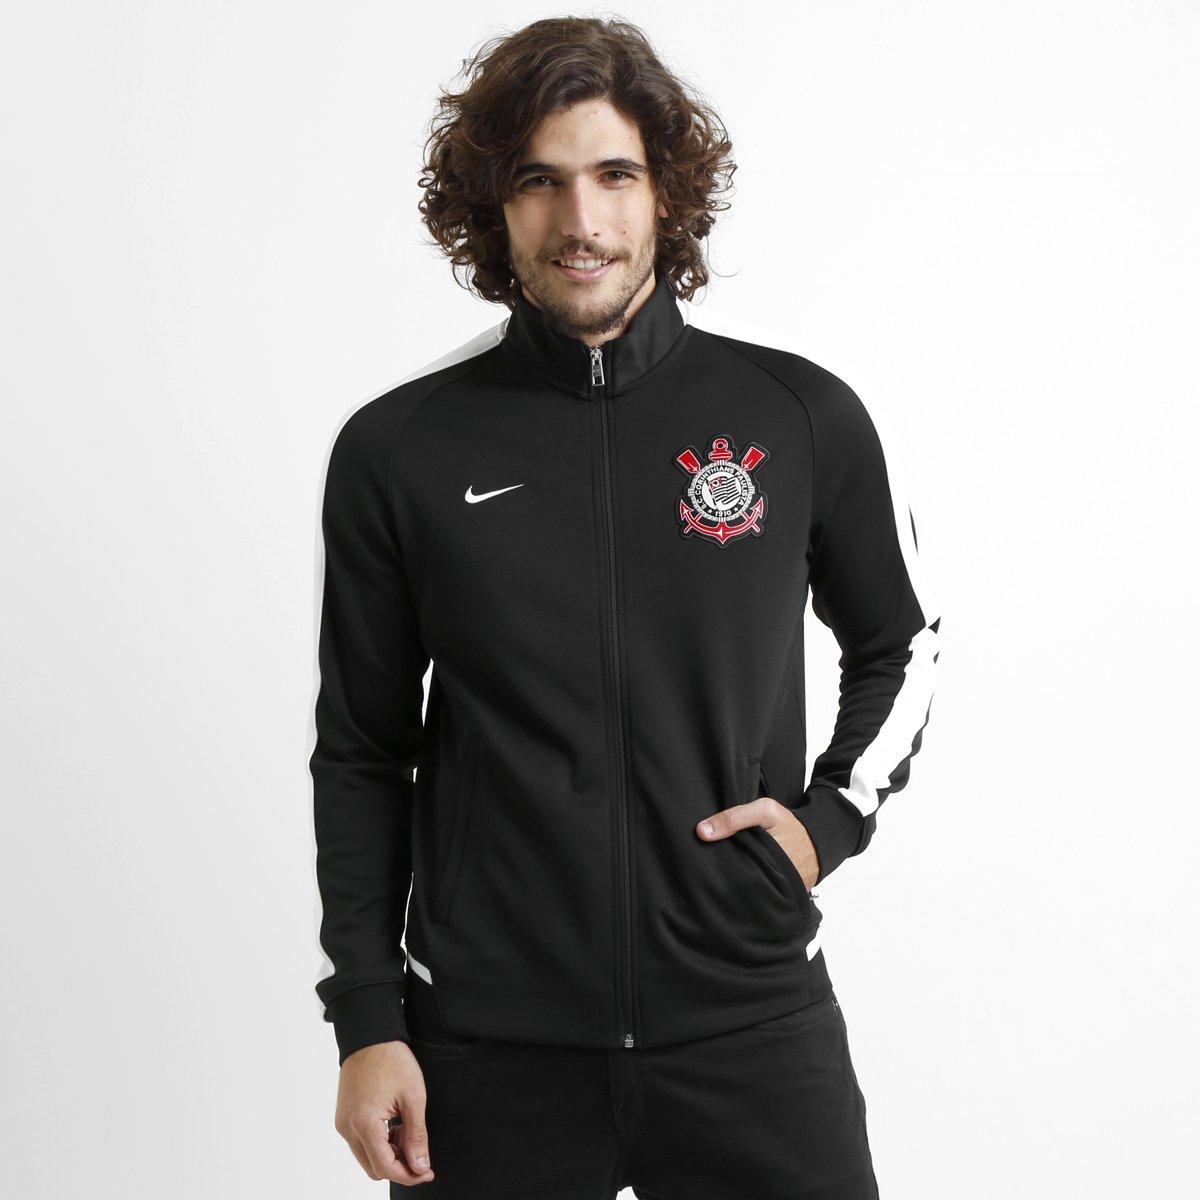 cae38f9aecc08 Jaqueta Nike Corinthians N98 Authentic - Compre Agora